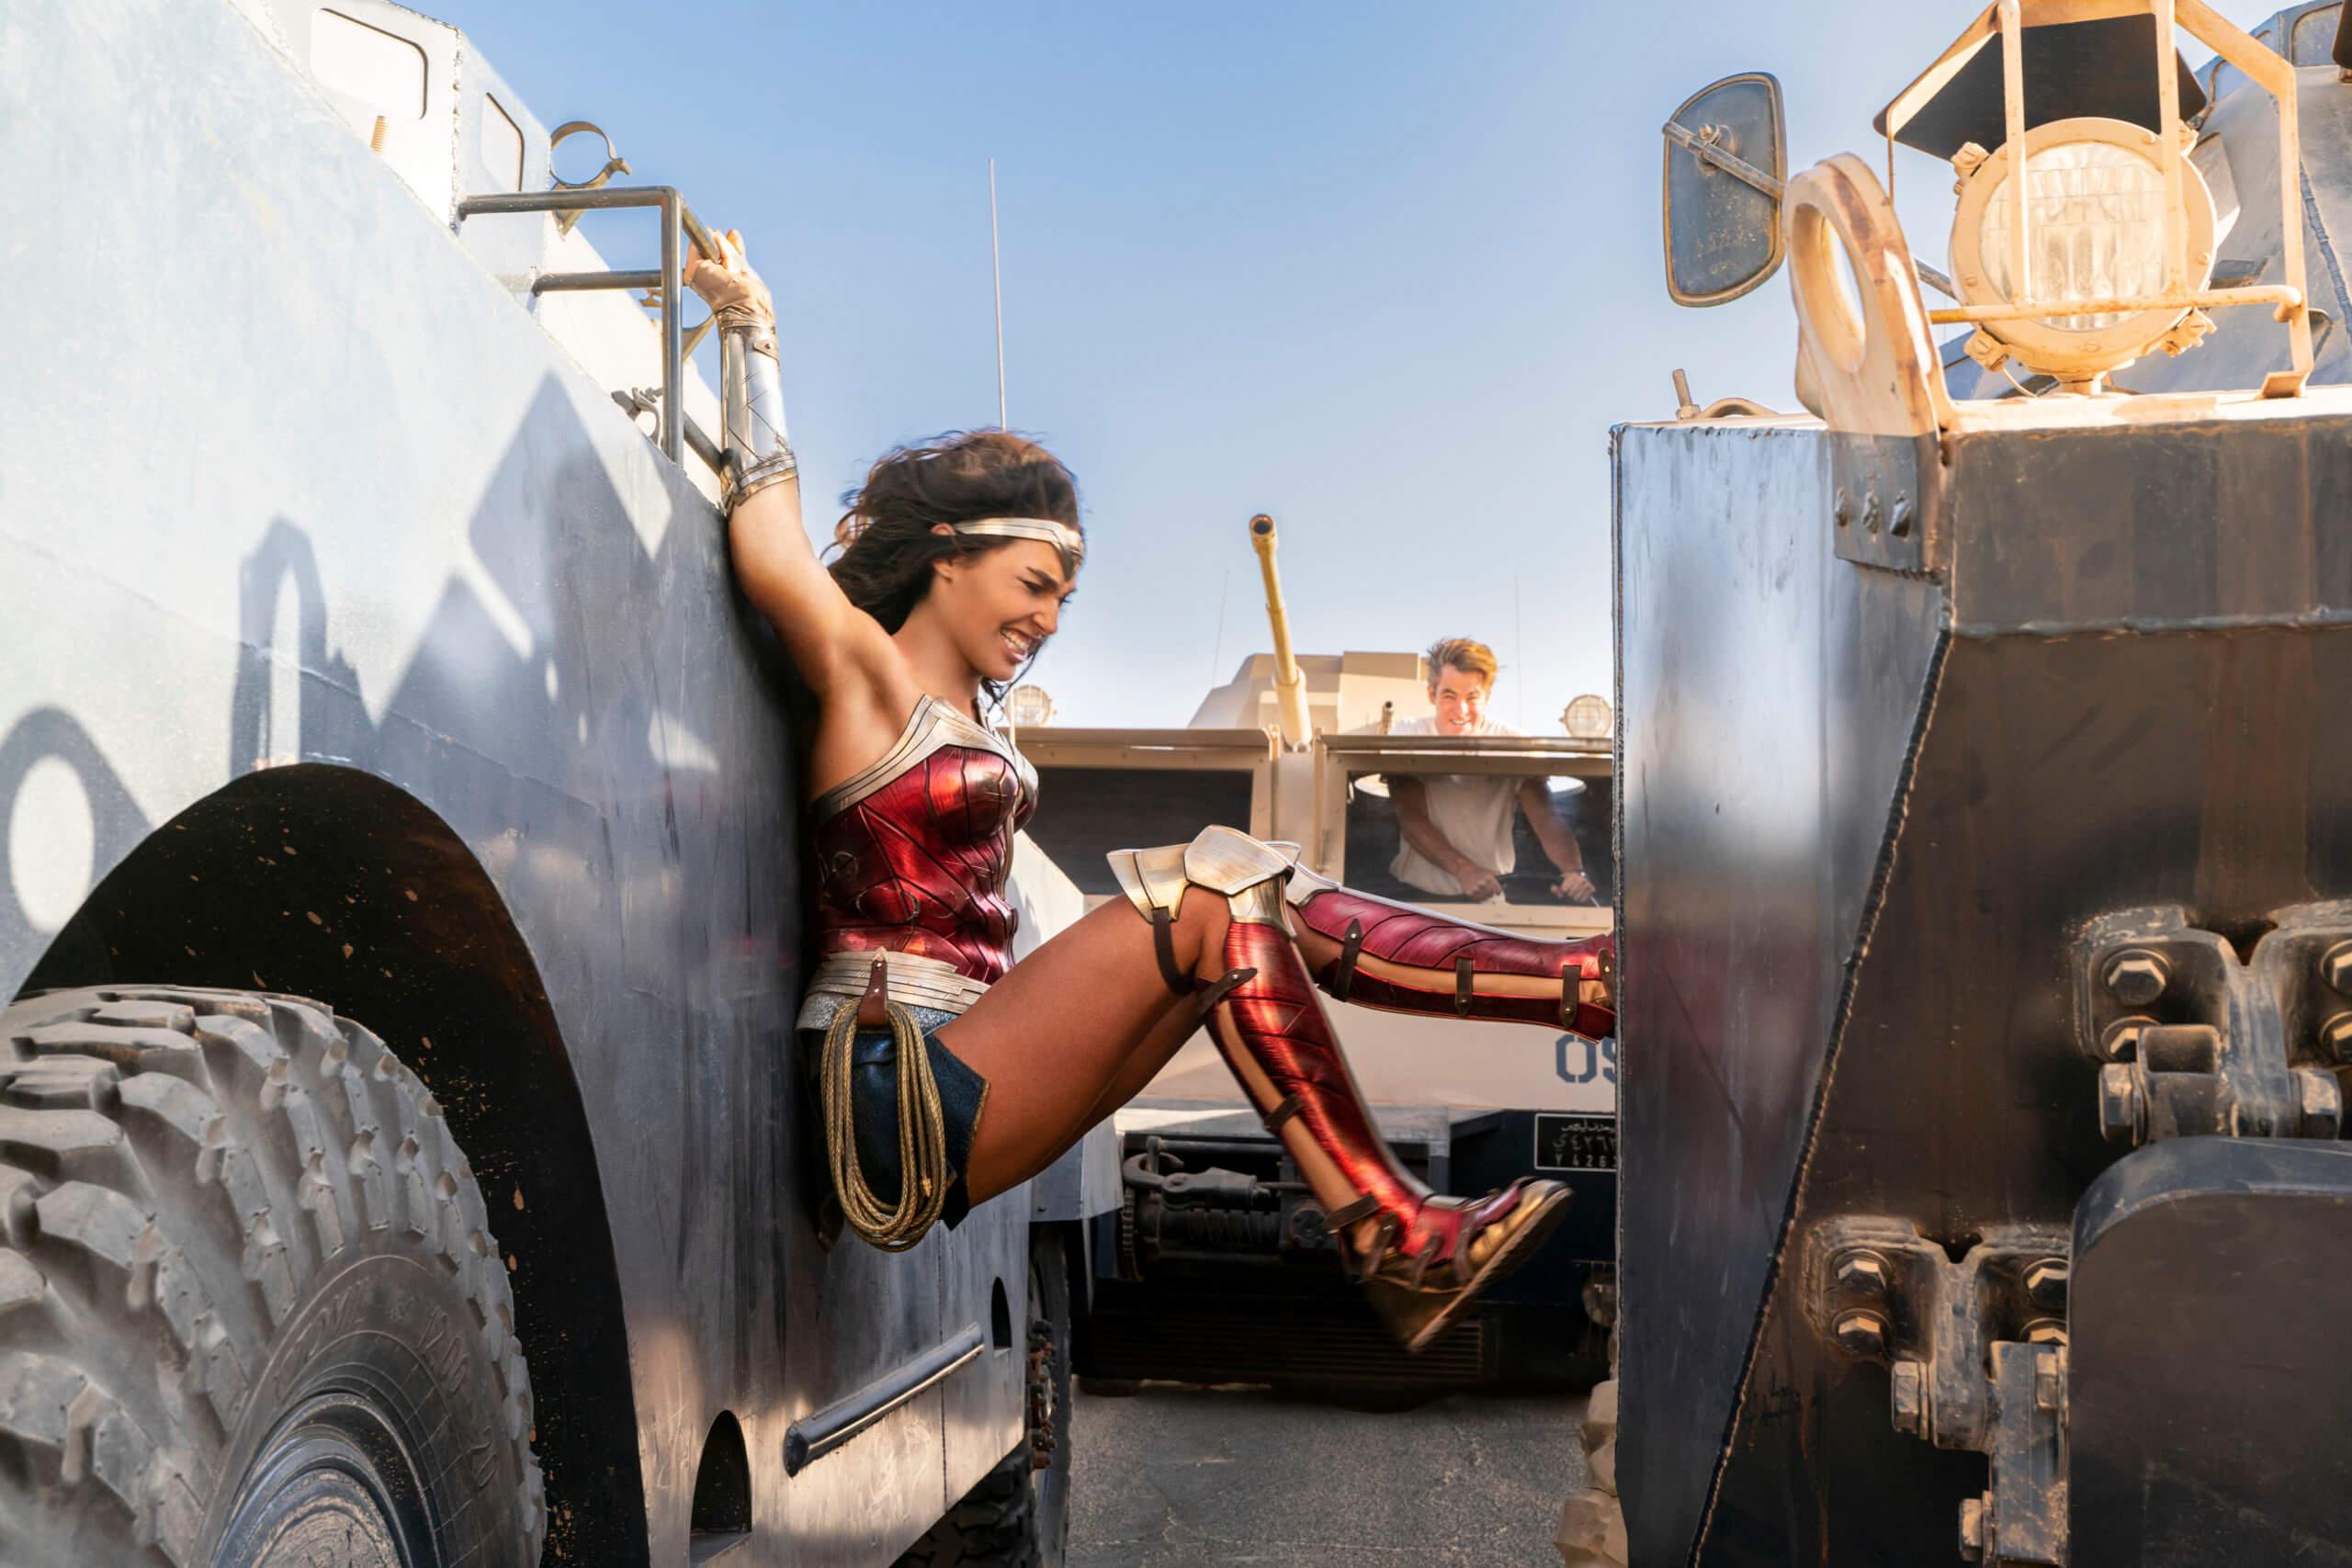 Gal Gadot as Wonder Woman in Wonder Woman 1984. Patty Jenkins (Director and Writer). Image courtesy Warner Brothers Media